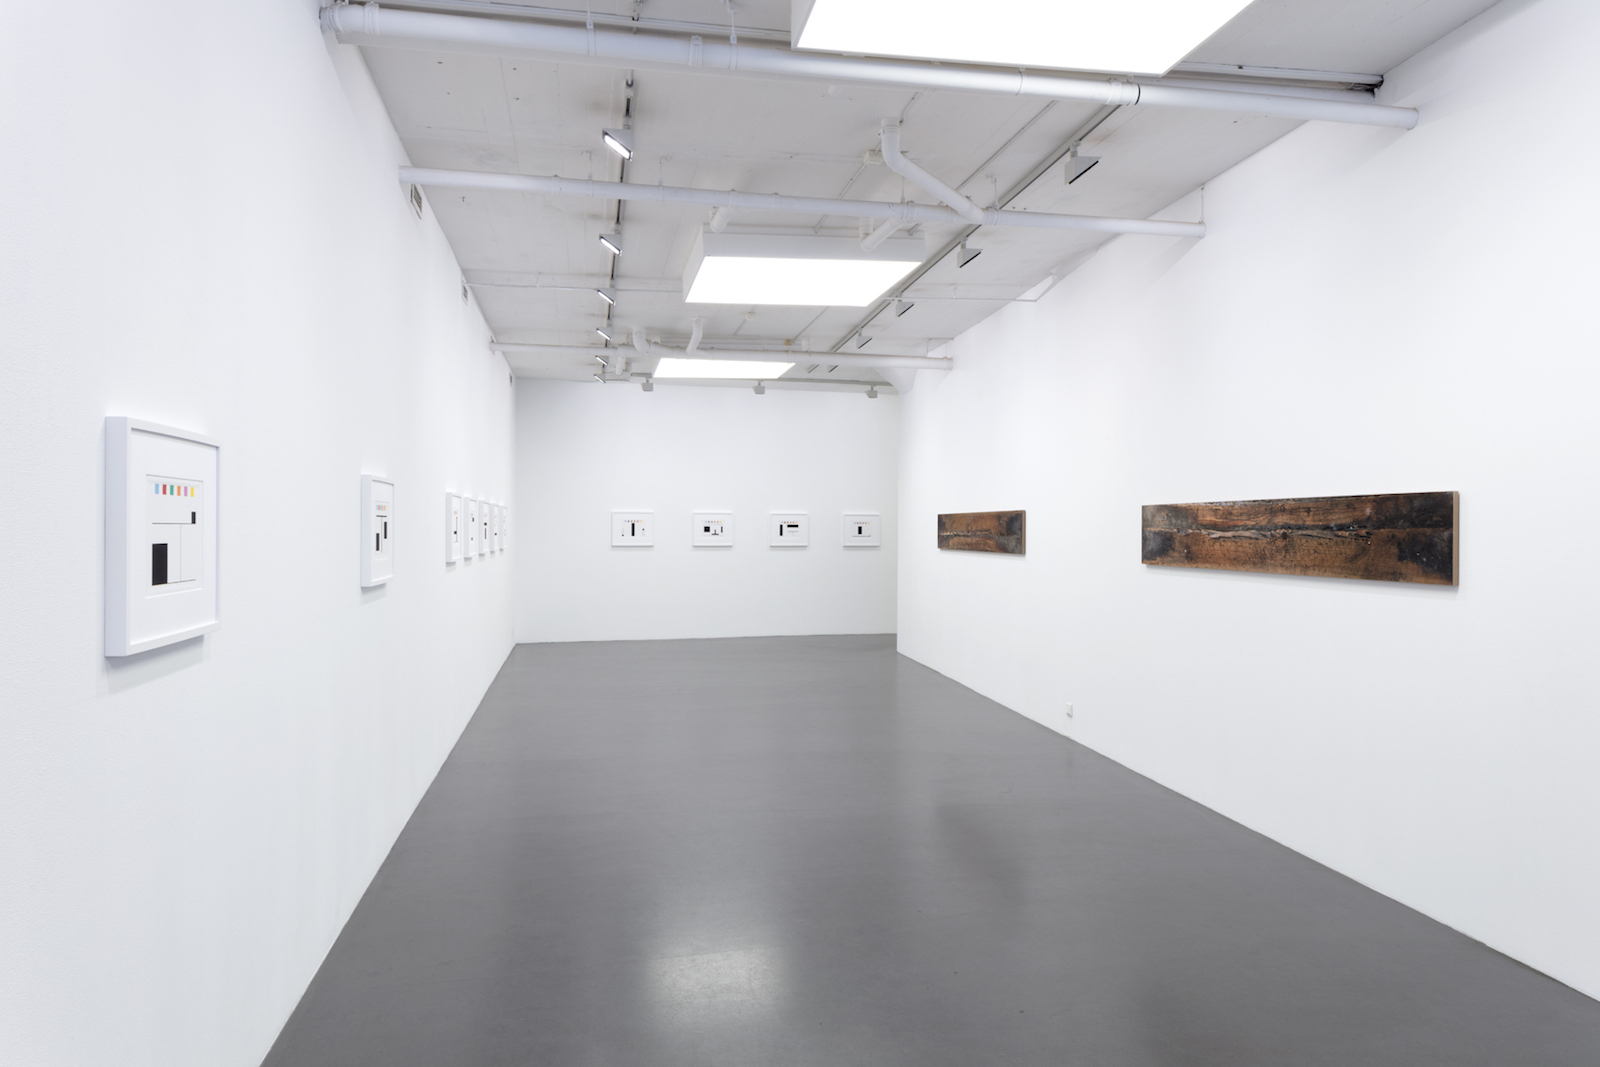 Kristoffer Nilson, Installation view FLAGG (FLAG), Galleri Flach 2017